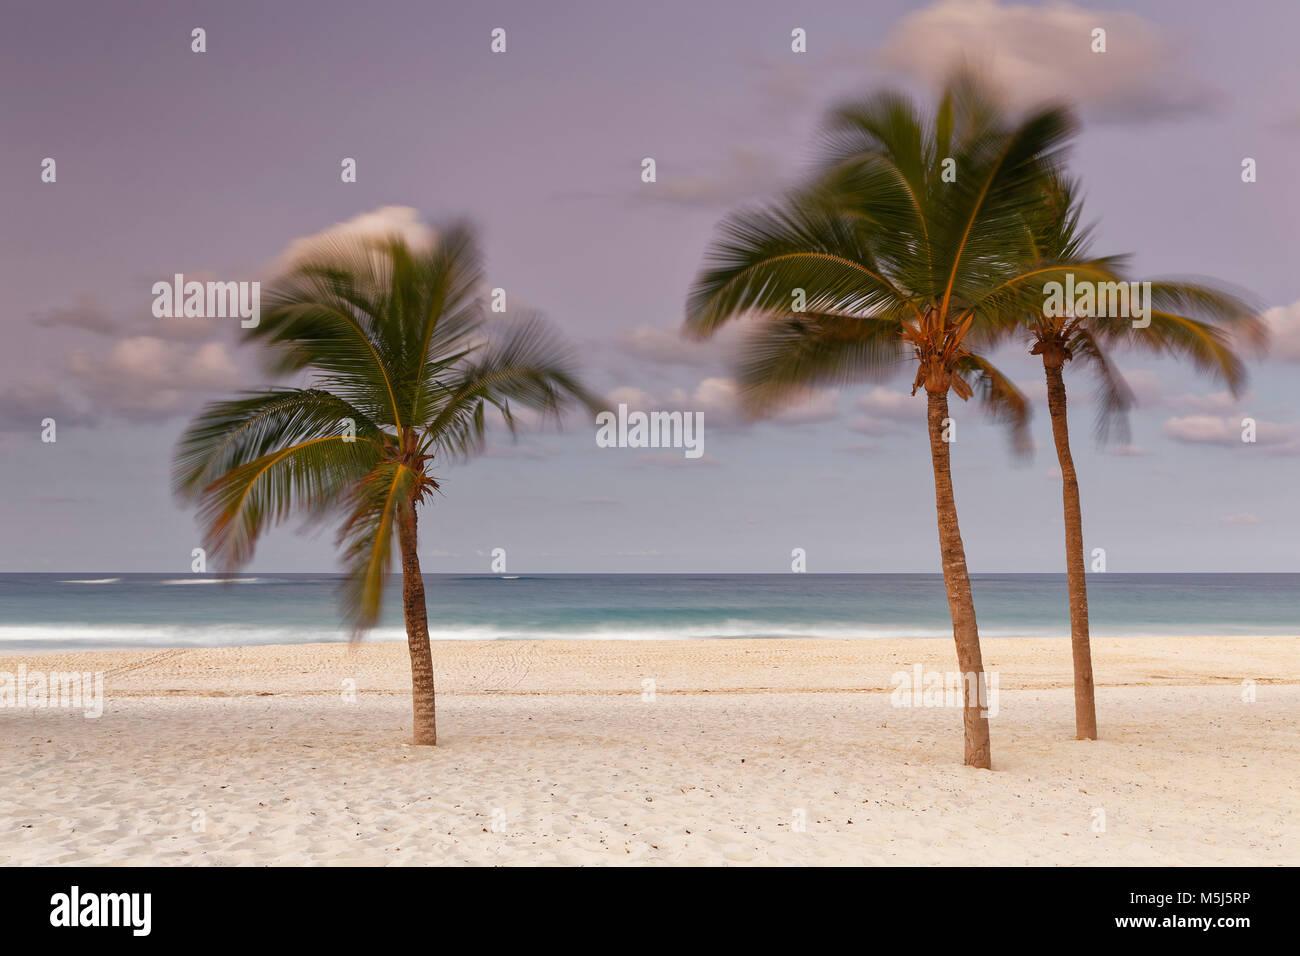 Carribean, Dominican Republic, Punta Cana, Playa Bavaro, moving palms on the beach at sunset - Stock Image